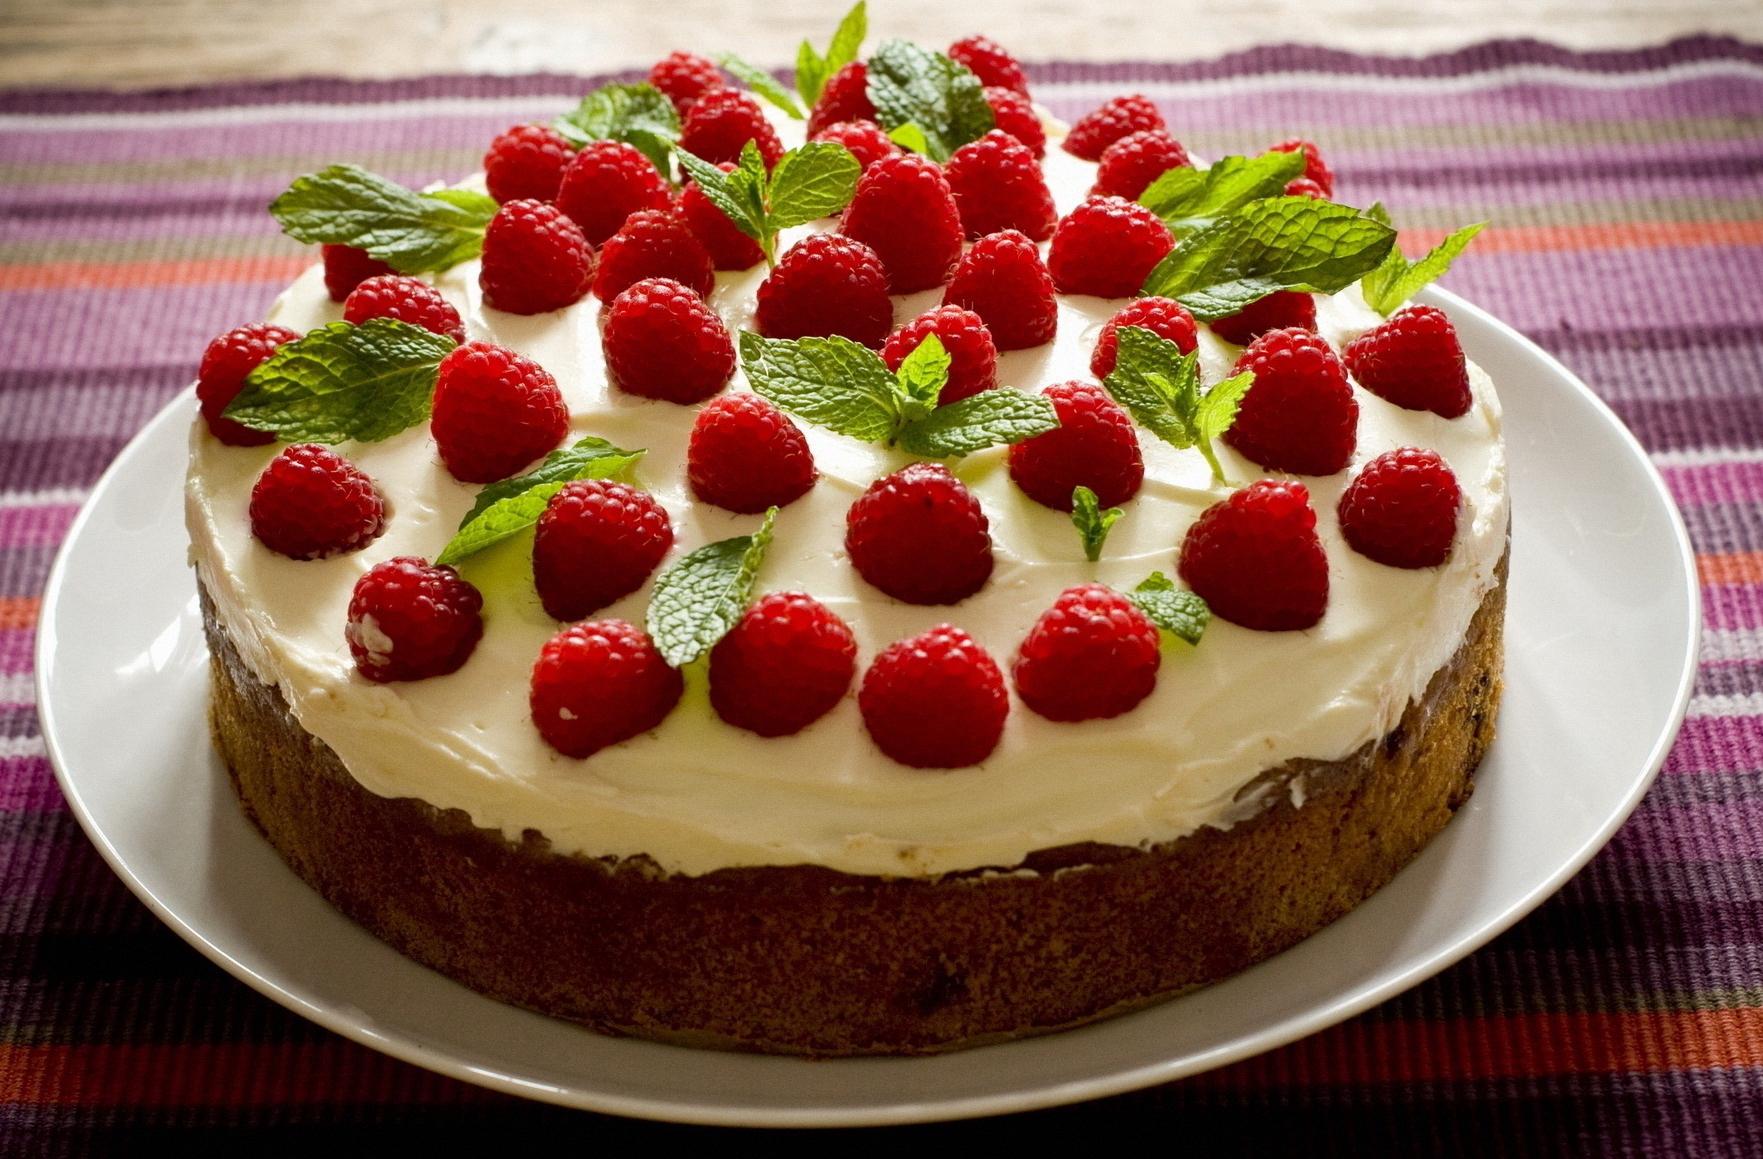 Тортик легко и быстро